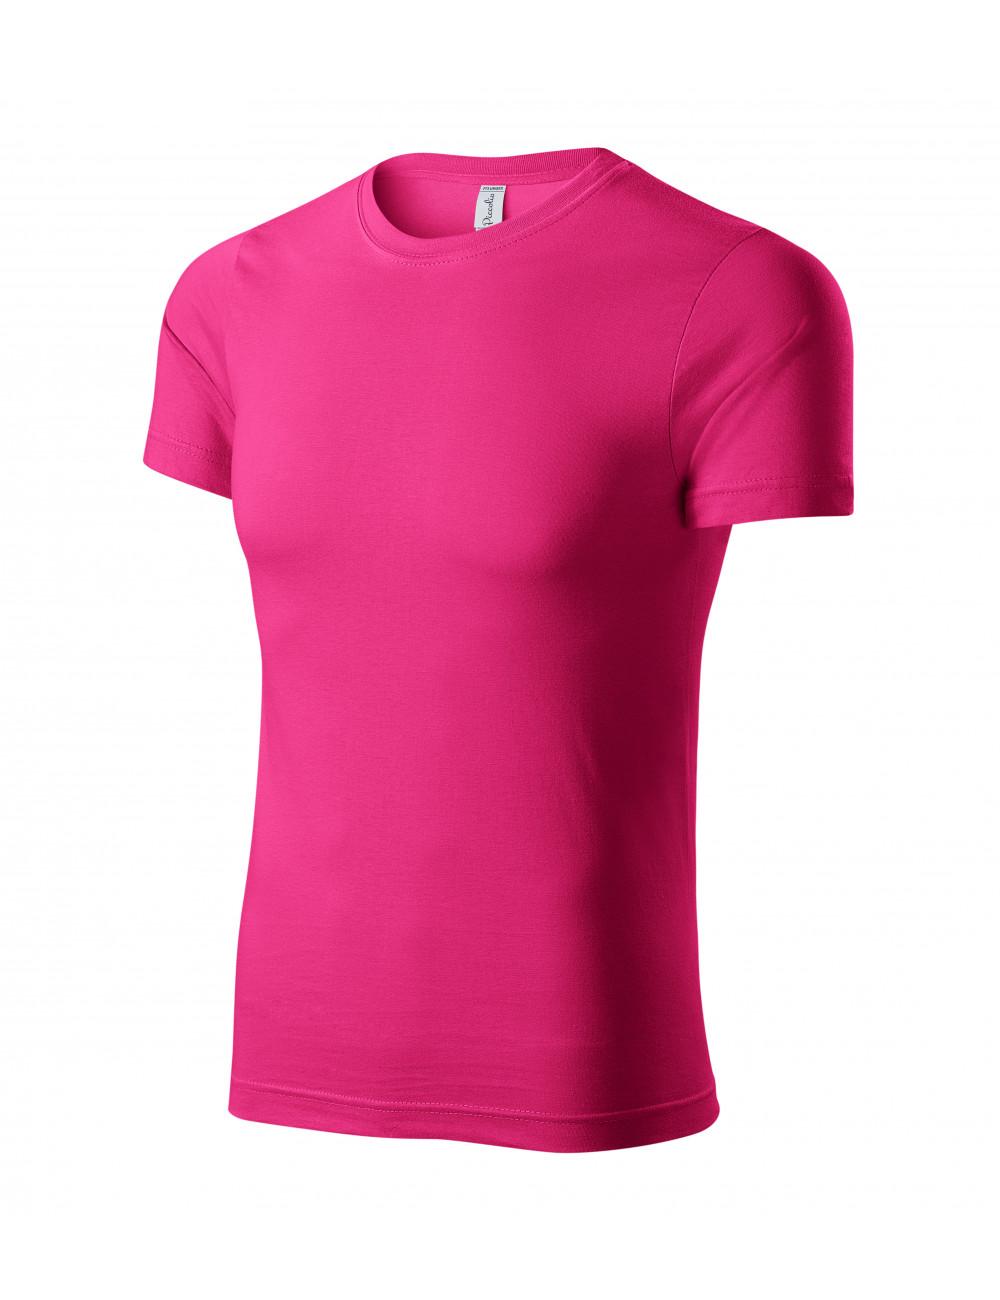 Adler PICCOLIO Koszulka unisex Paint P73 czerwień purpurowa